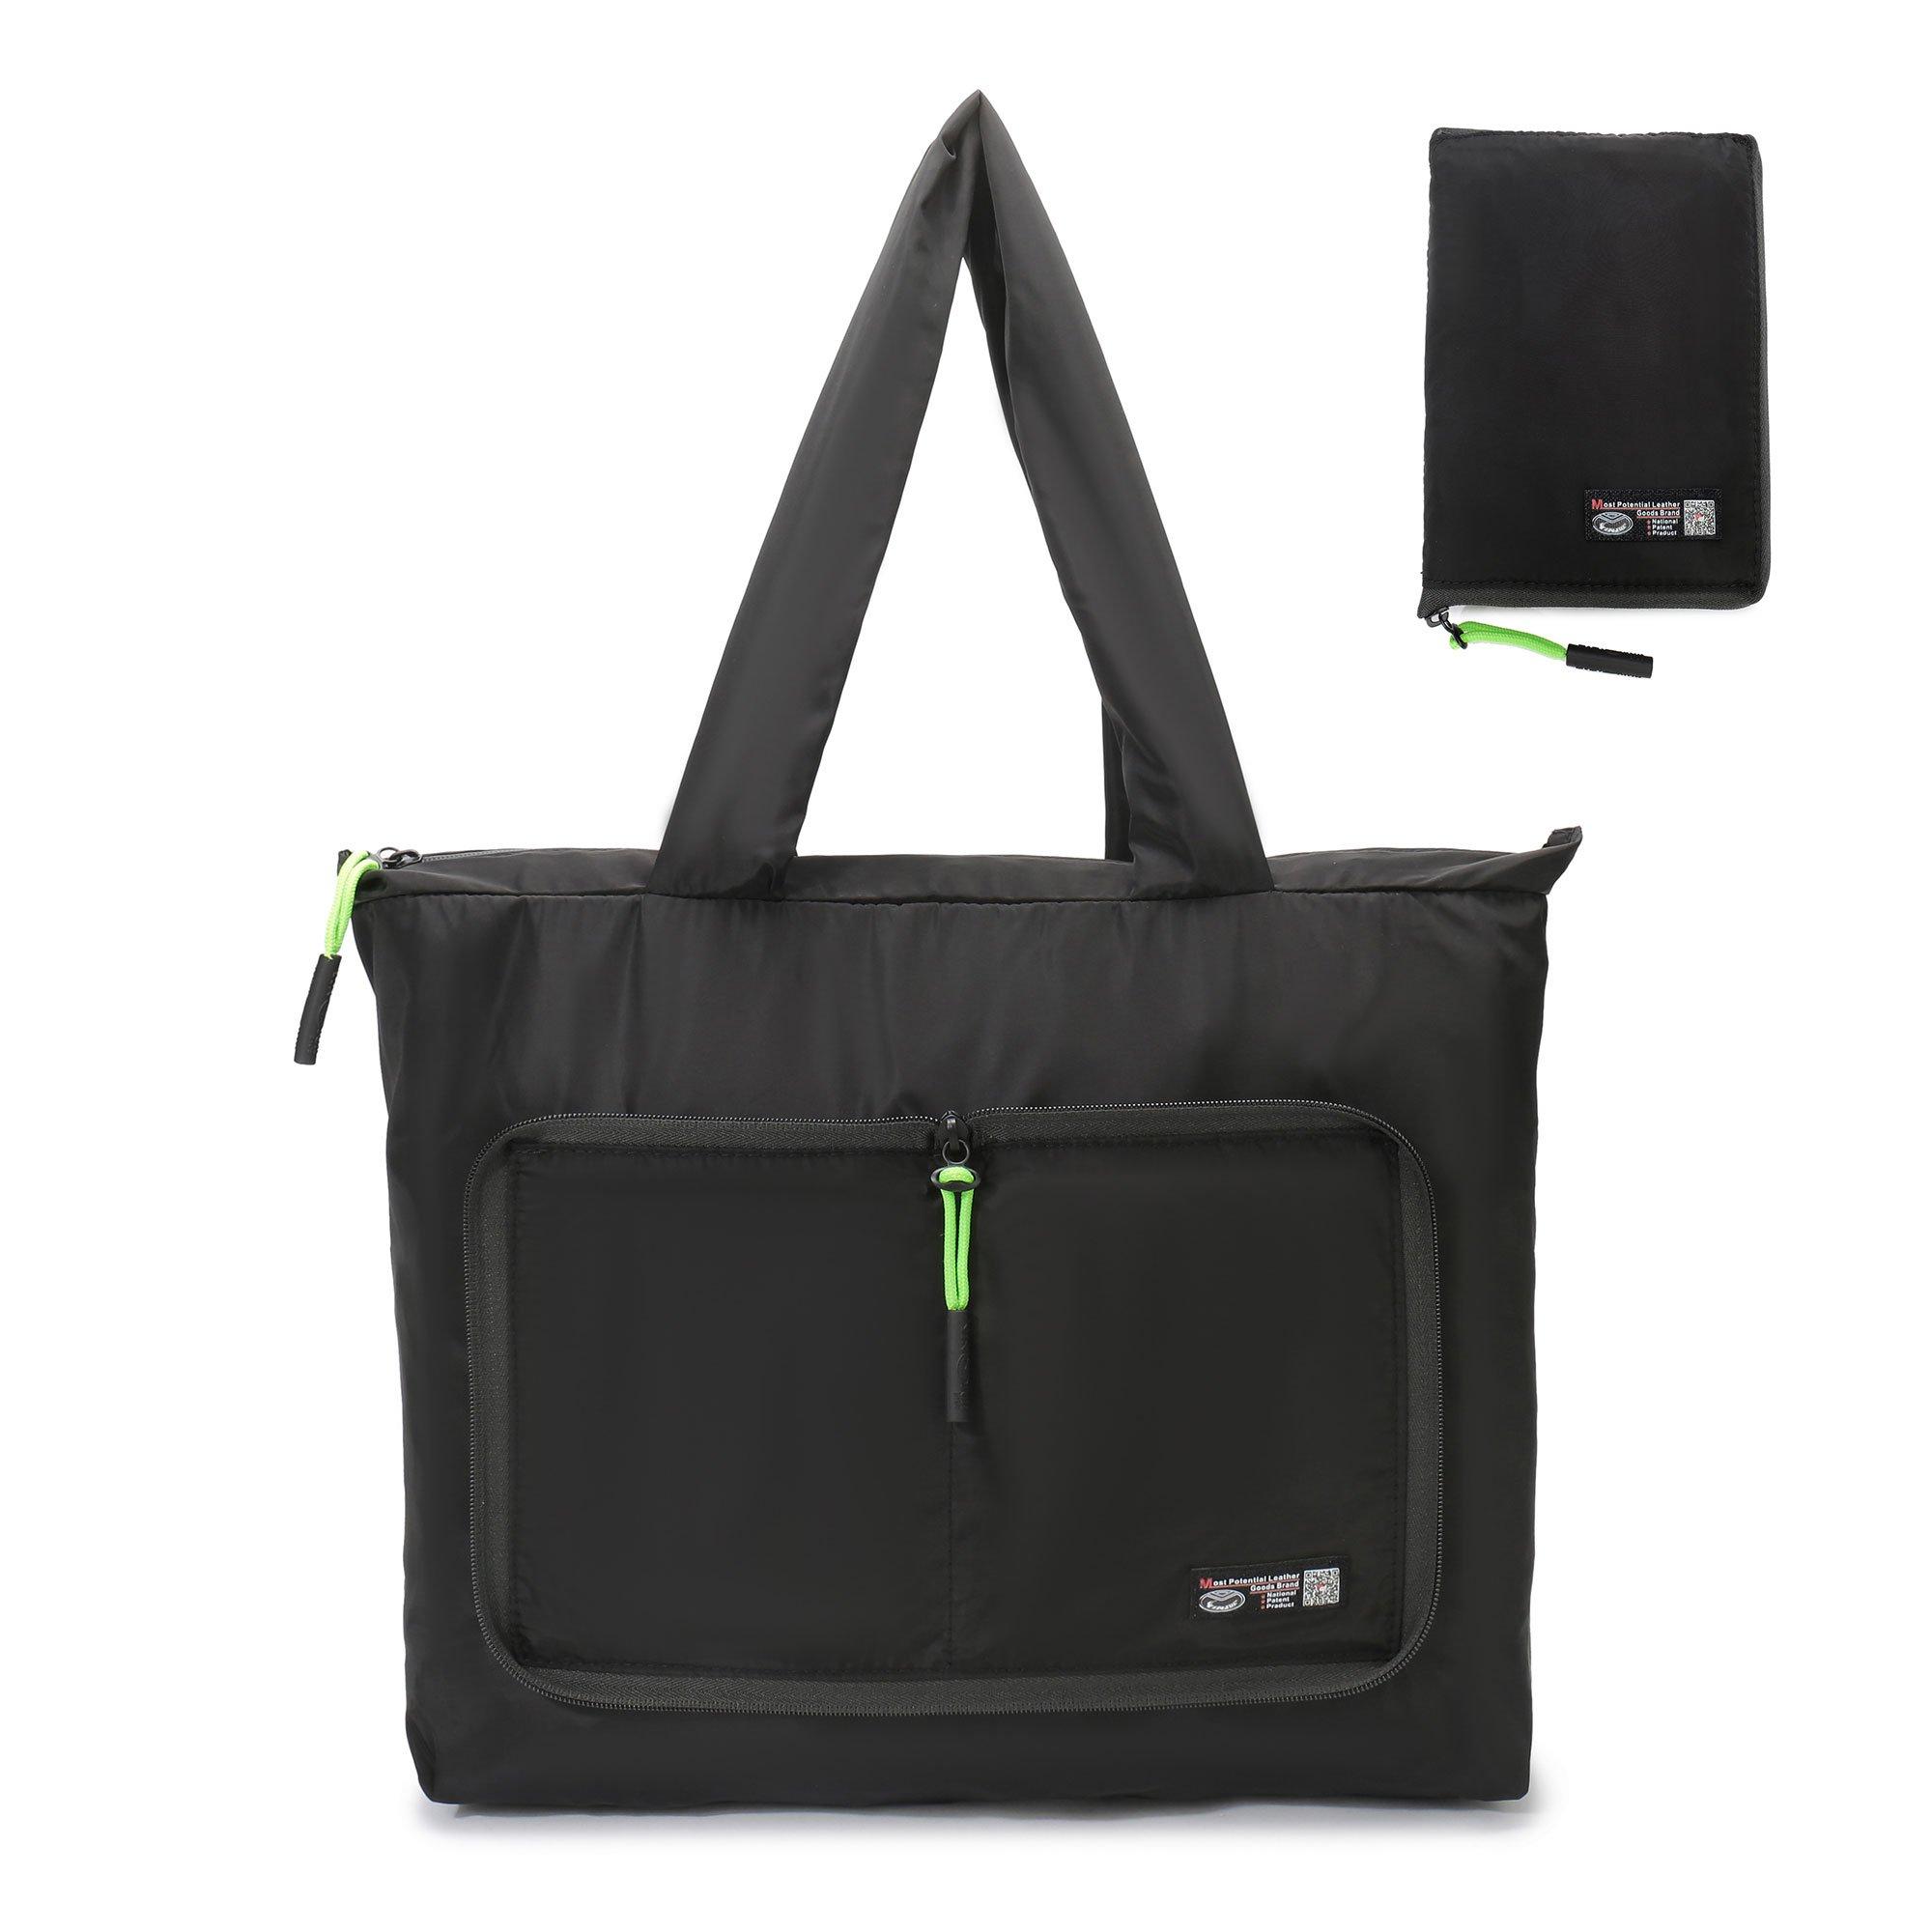 Foldable Gym Tote Bag,Lightweight Yoga Sport Shopping Beach Bag Utility Large Handbags for Travel